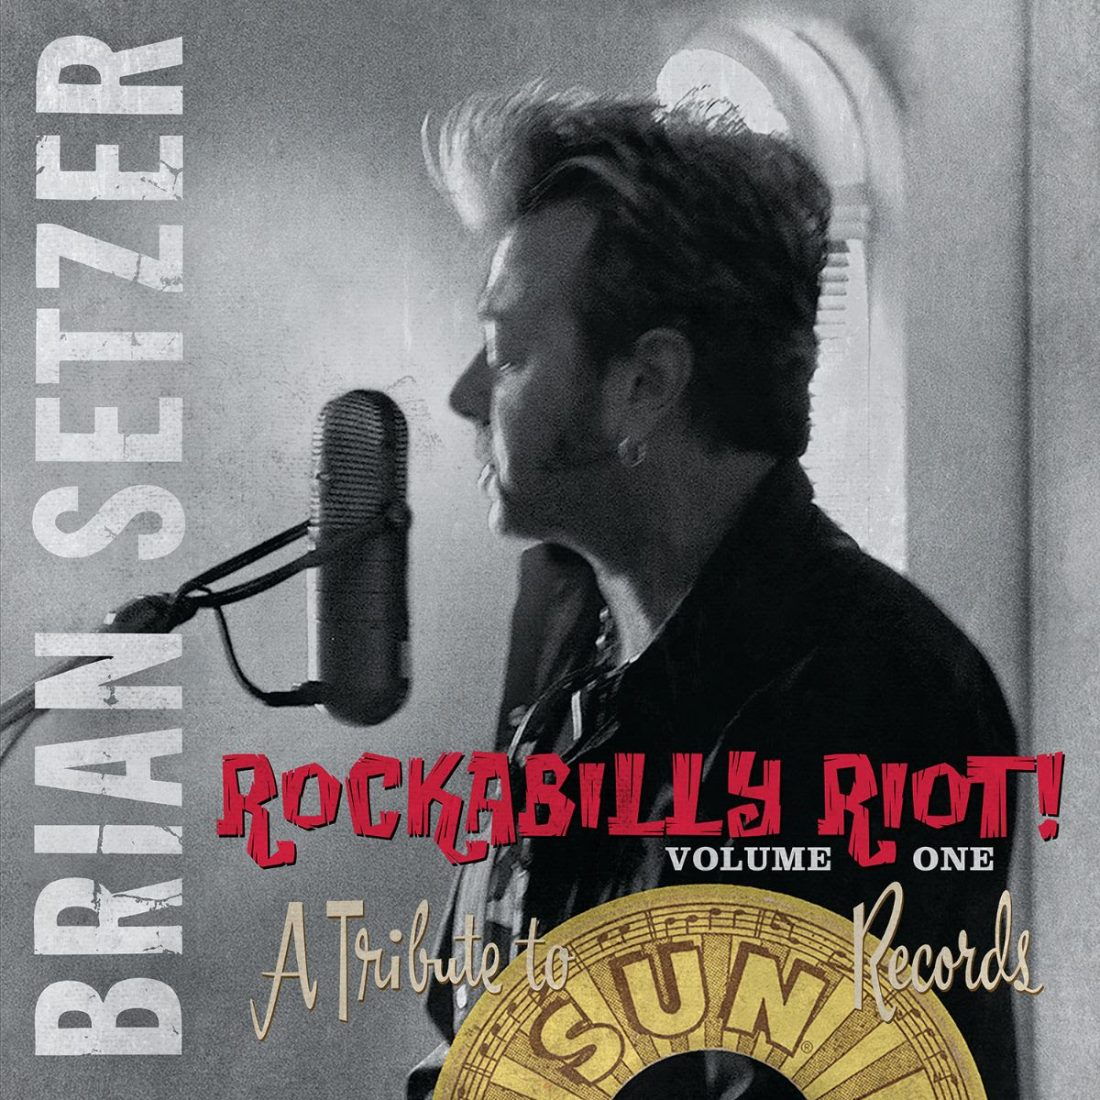 Brian Setzer's Sun Records tribute album to be reissued